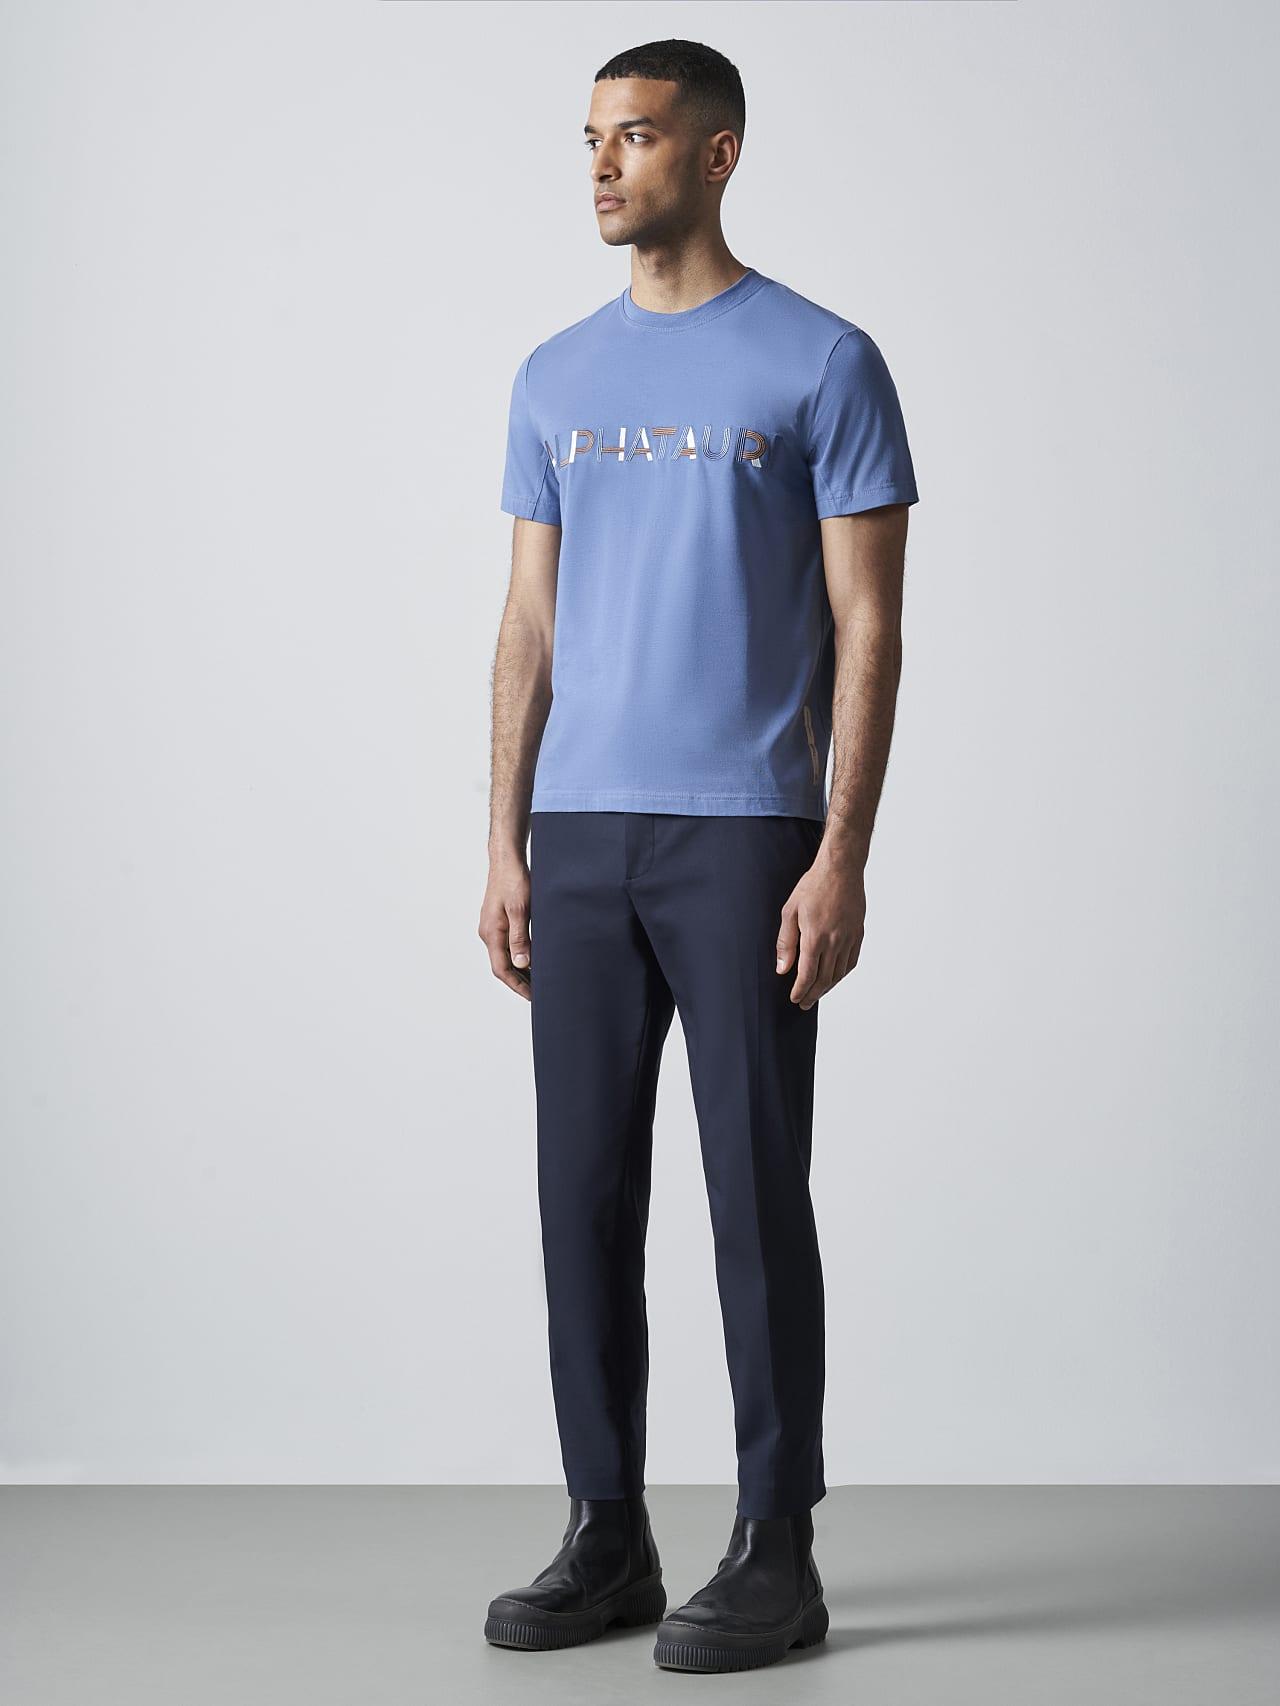 JANOS V3.Y5.02 Logo Embroidery T-Shirt light blue Front Alpha Tauri